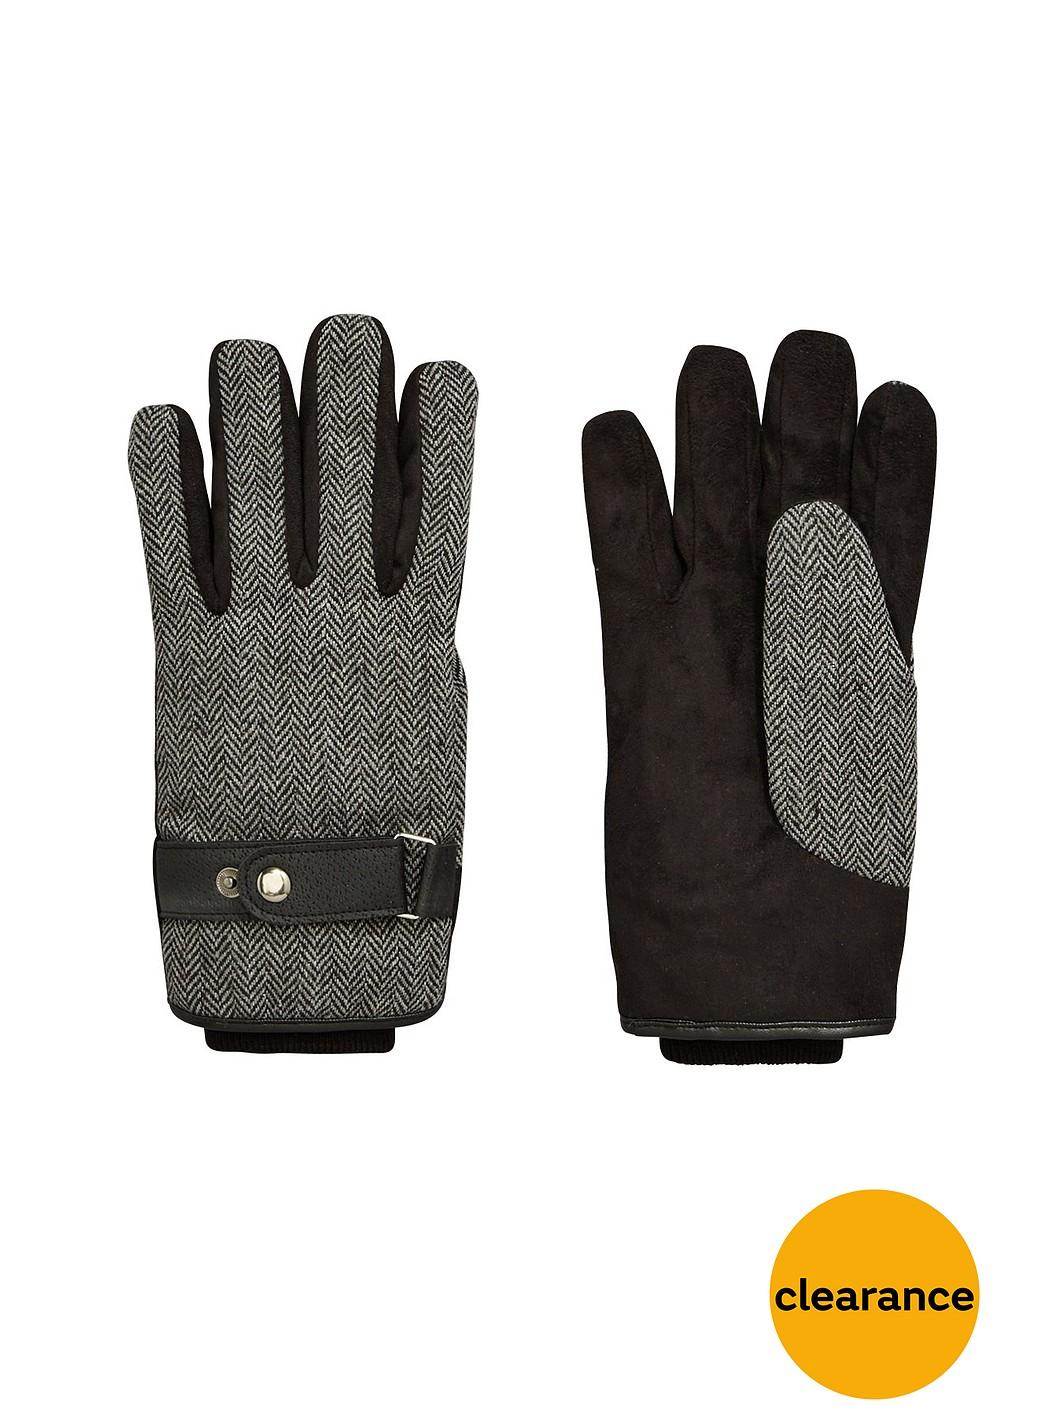 Mens gloves at matalan - Mens Gloves At Matalan 16